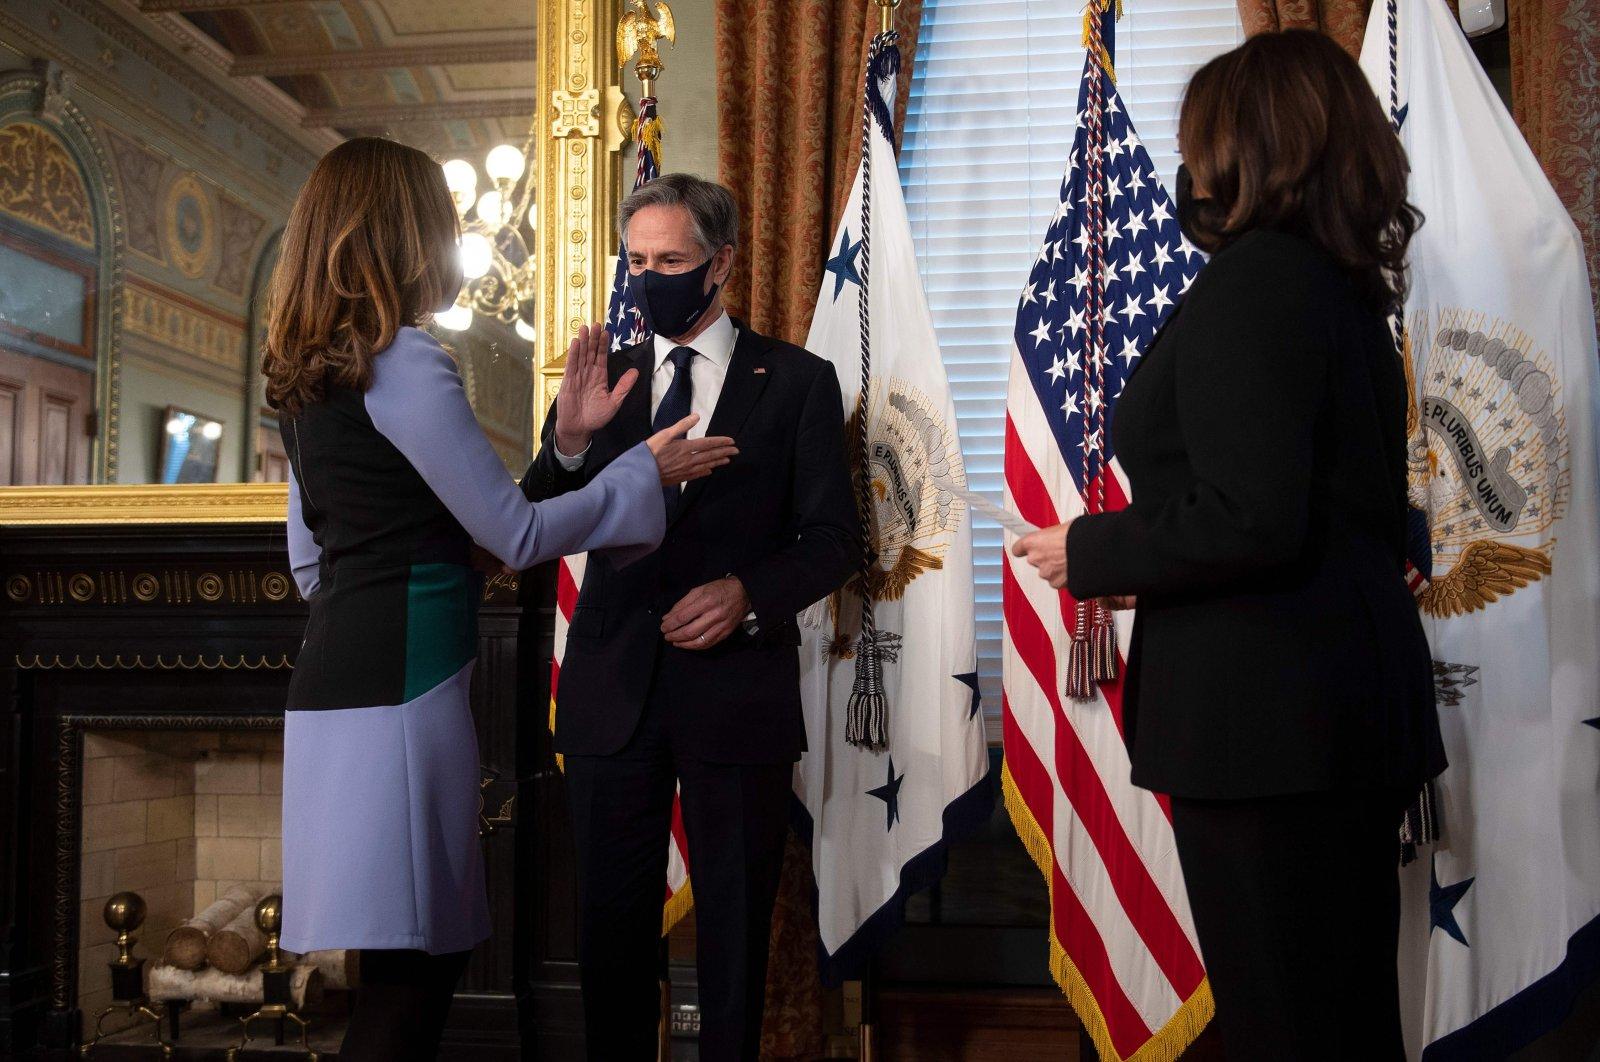 U.S. Secretary of State Antony Blinken and his wife Evan Ryan (L) take part in a ceremonial swearing-in with U.S. Vice President Kamala Harris (R), Washington, D.C., the U.S., Jan. 27, 2021. (AFP Photo)